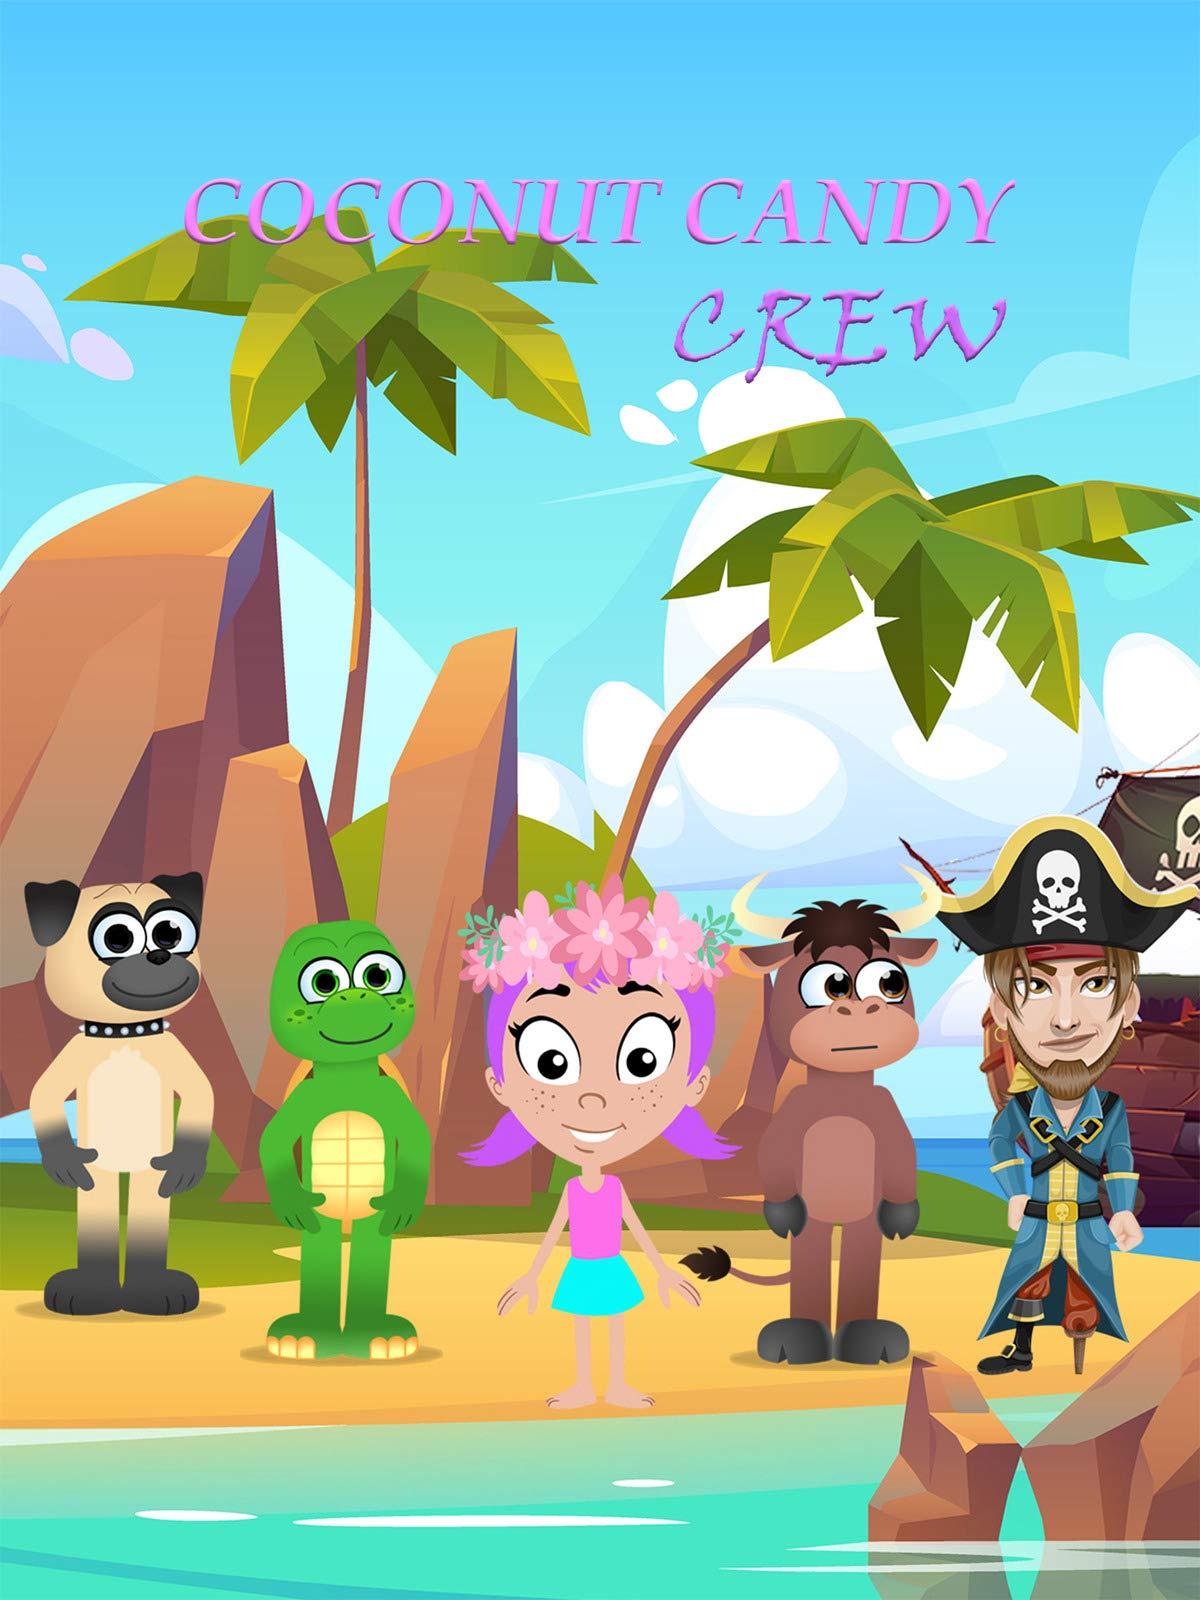 Coconut Candy Crew